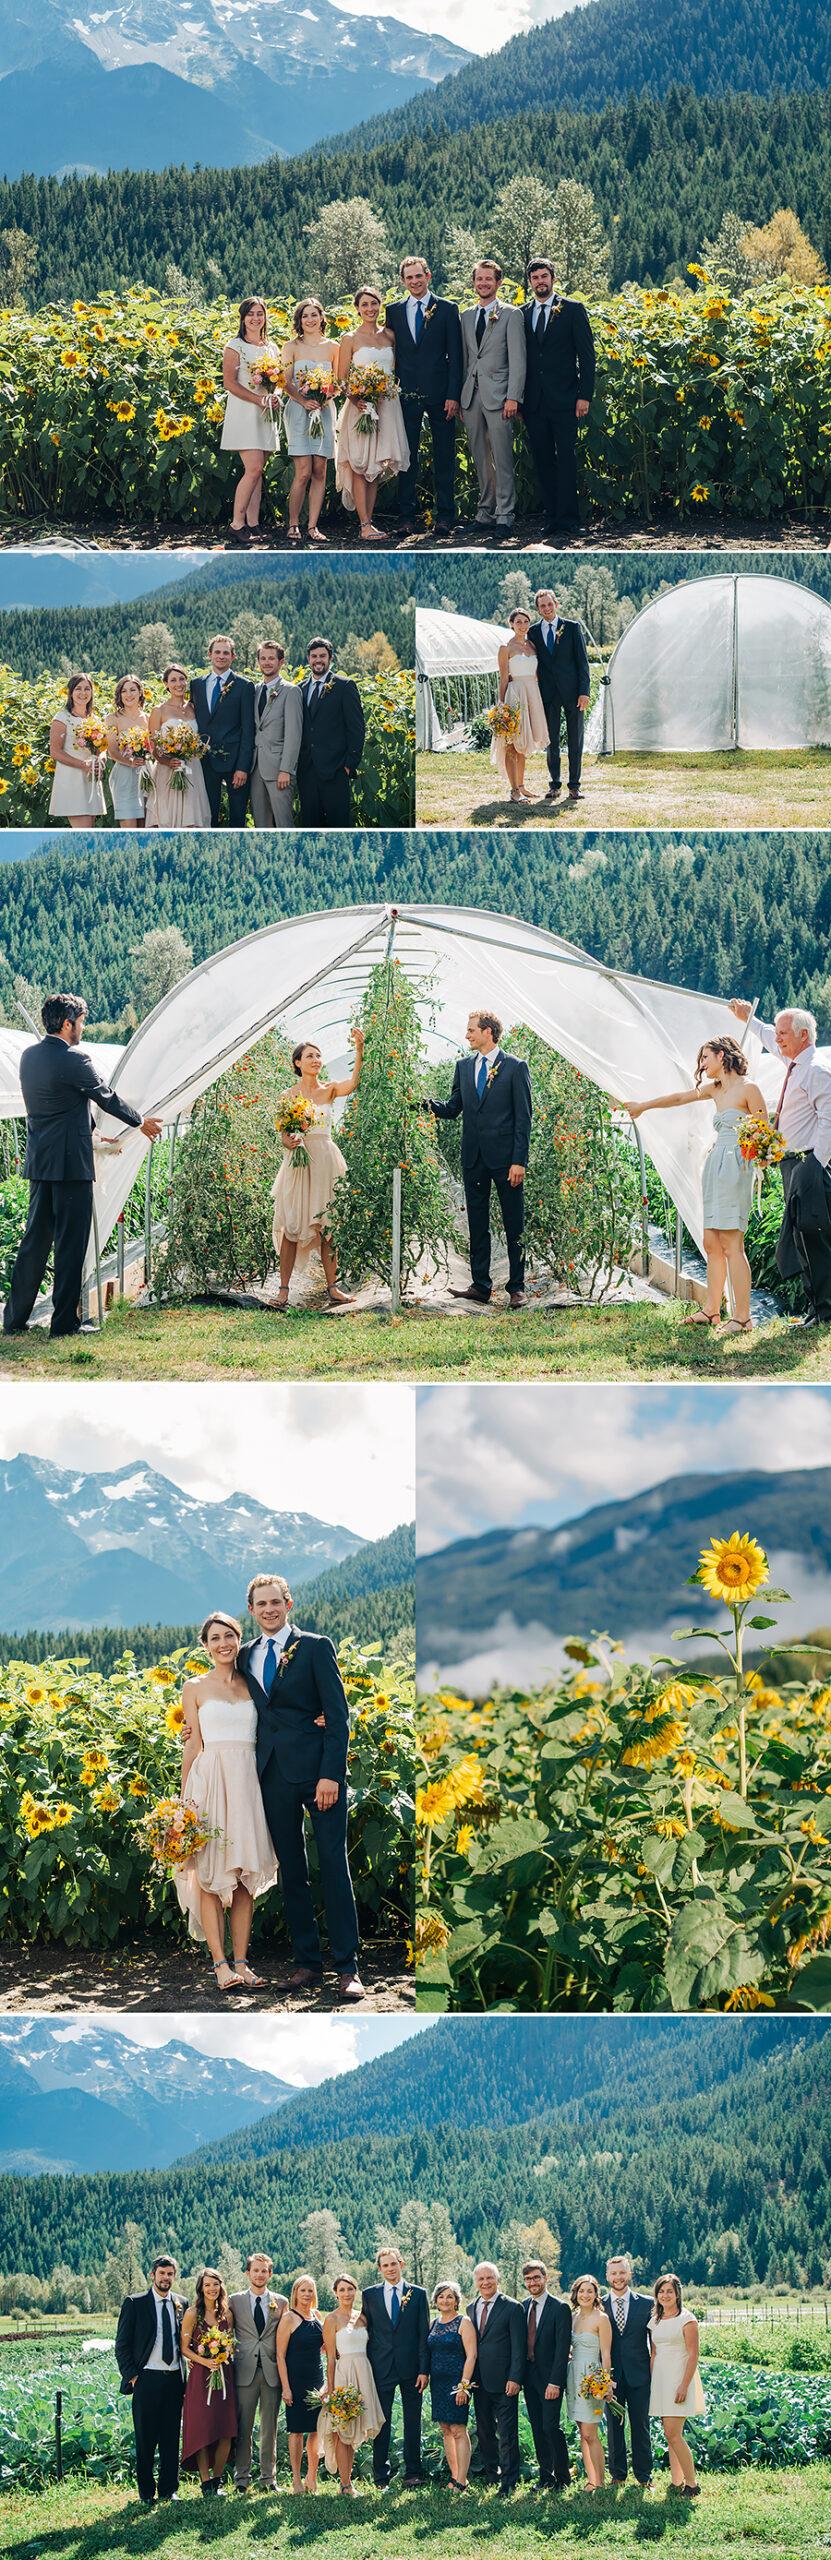 Pemberton BC wedding, farm wedding, plenty wild farms, sunflowers, family portraits